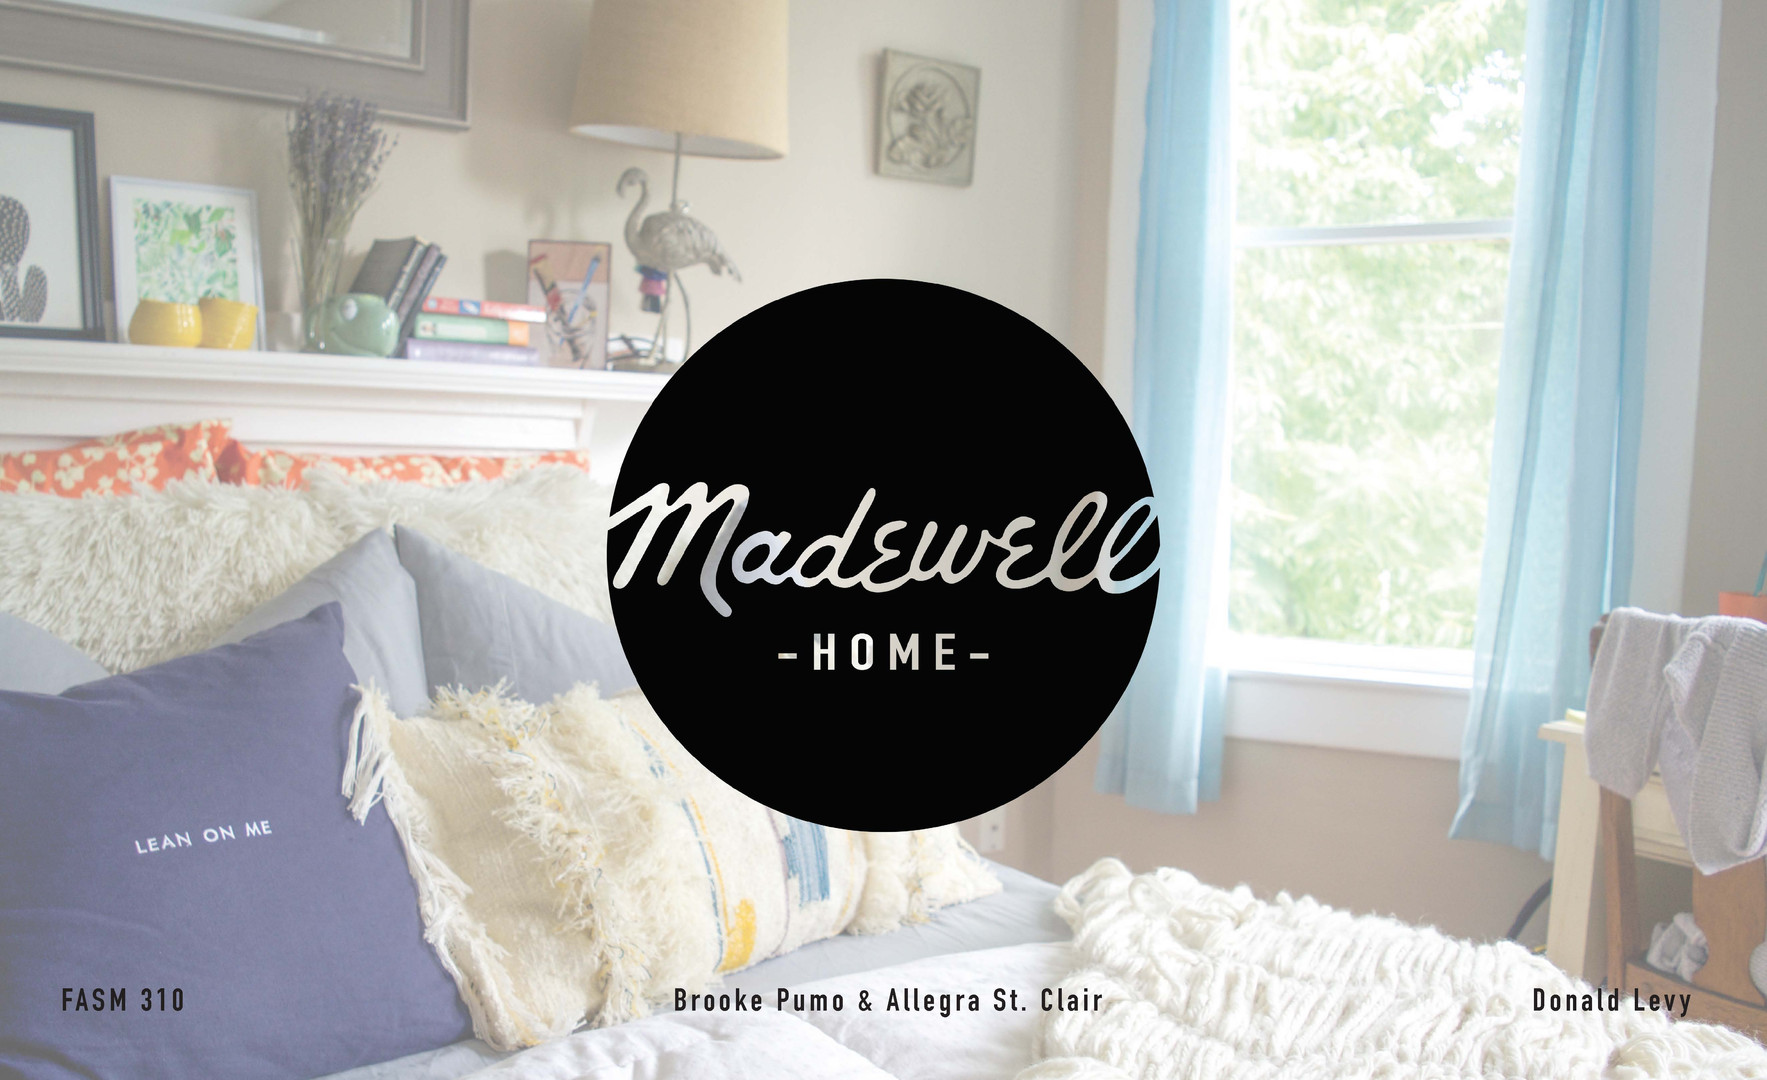 MadewellHomepresentation_Page_01.jpg